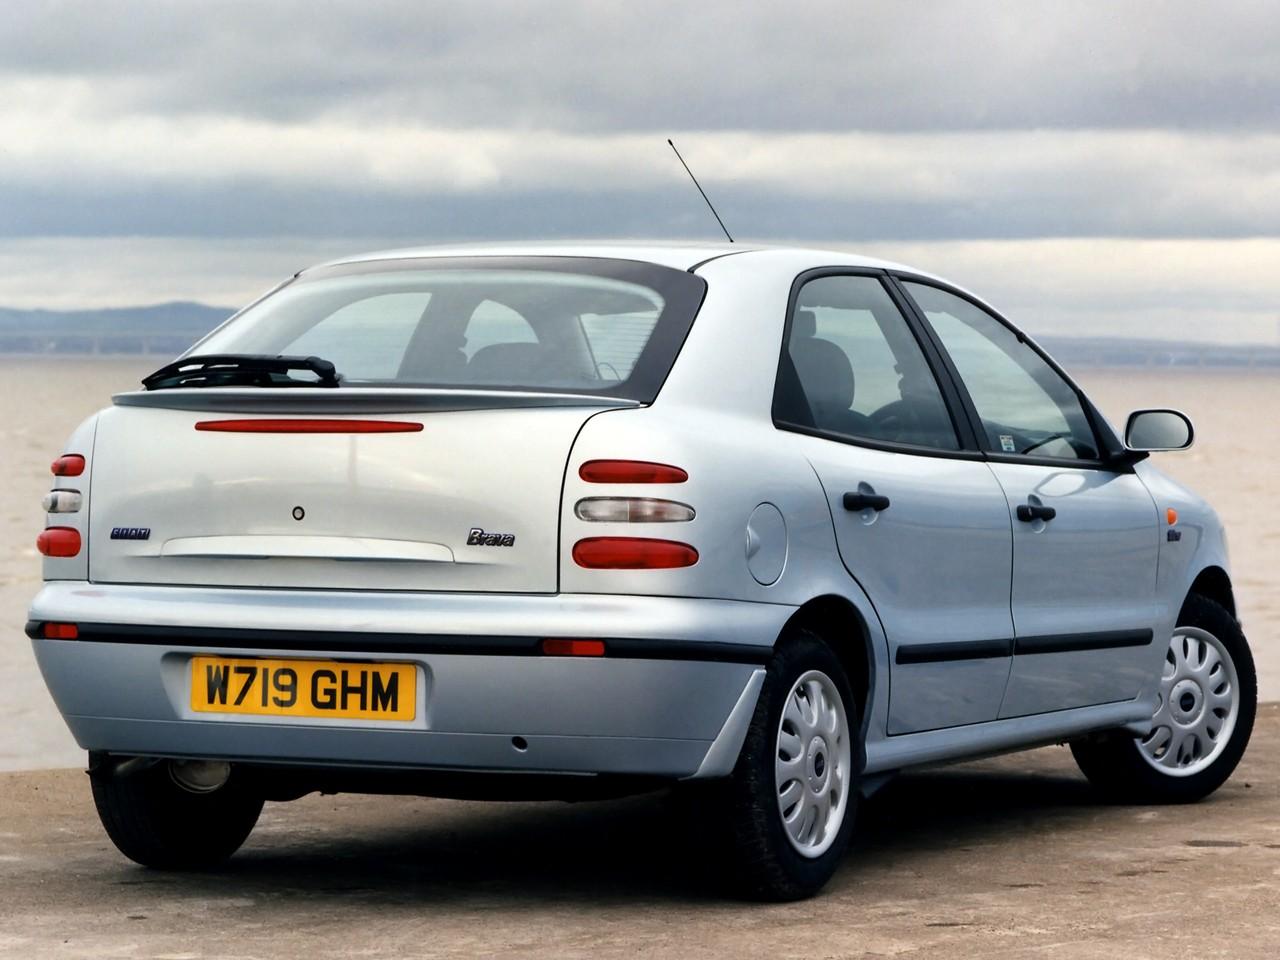 Cars On Line >> FIAT Brava - 1995, 1996, 1997, 1998, 1999, 2000, 2001 - autoevolution